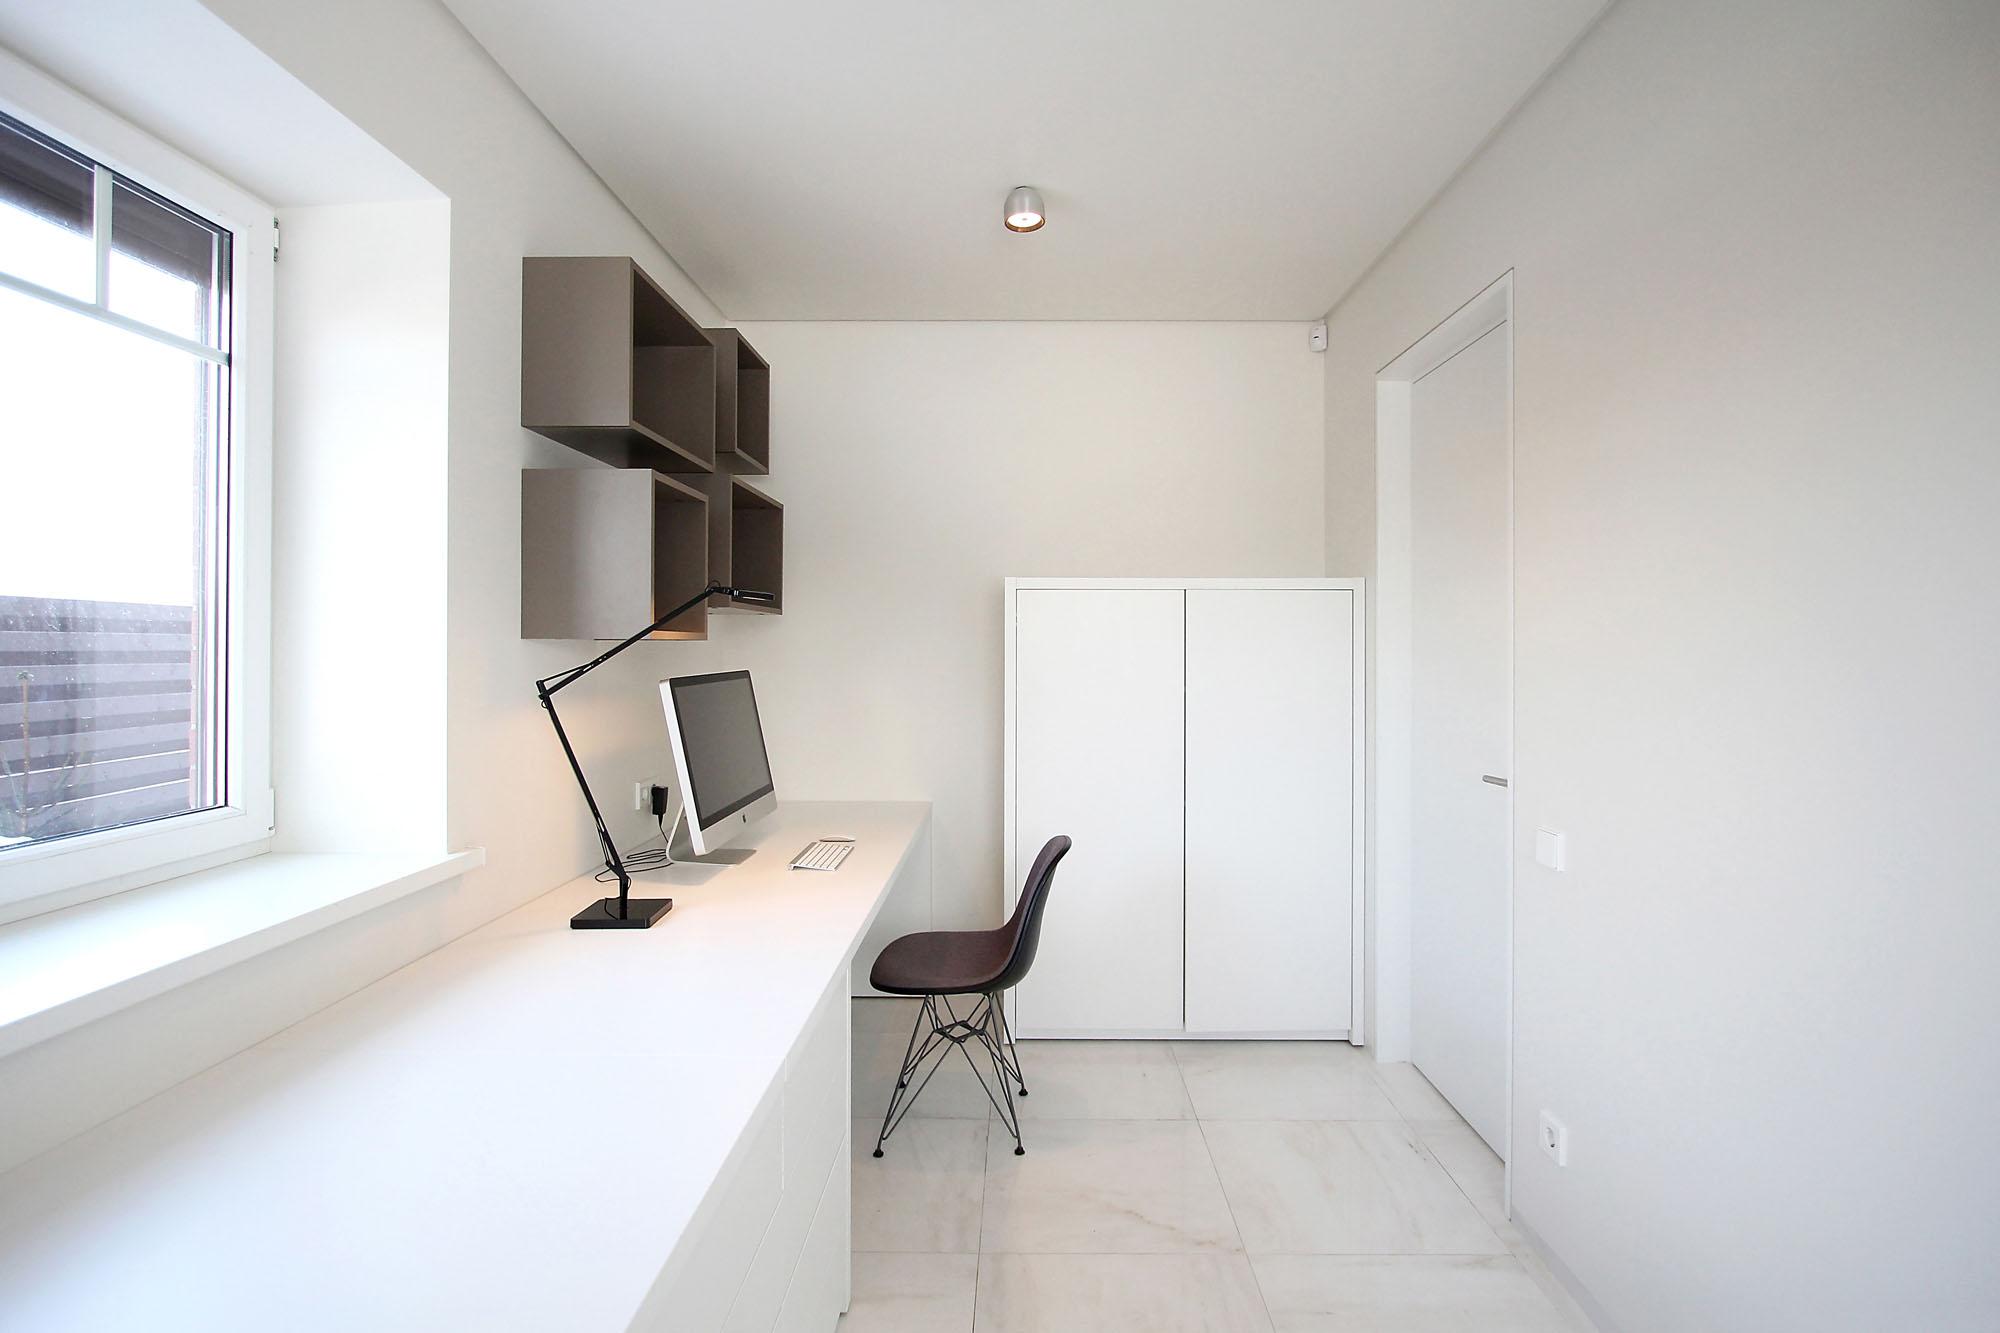 Minimal Style and White Colour Theme of House 02 by Ramunas Manikas-15